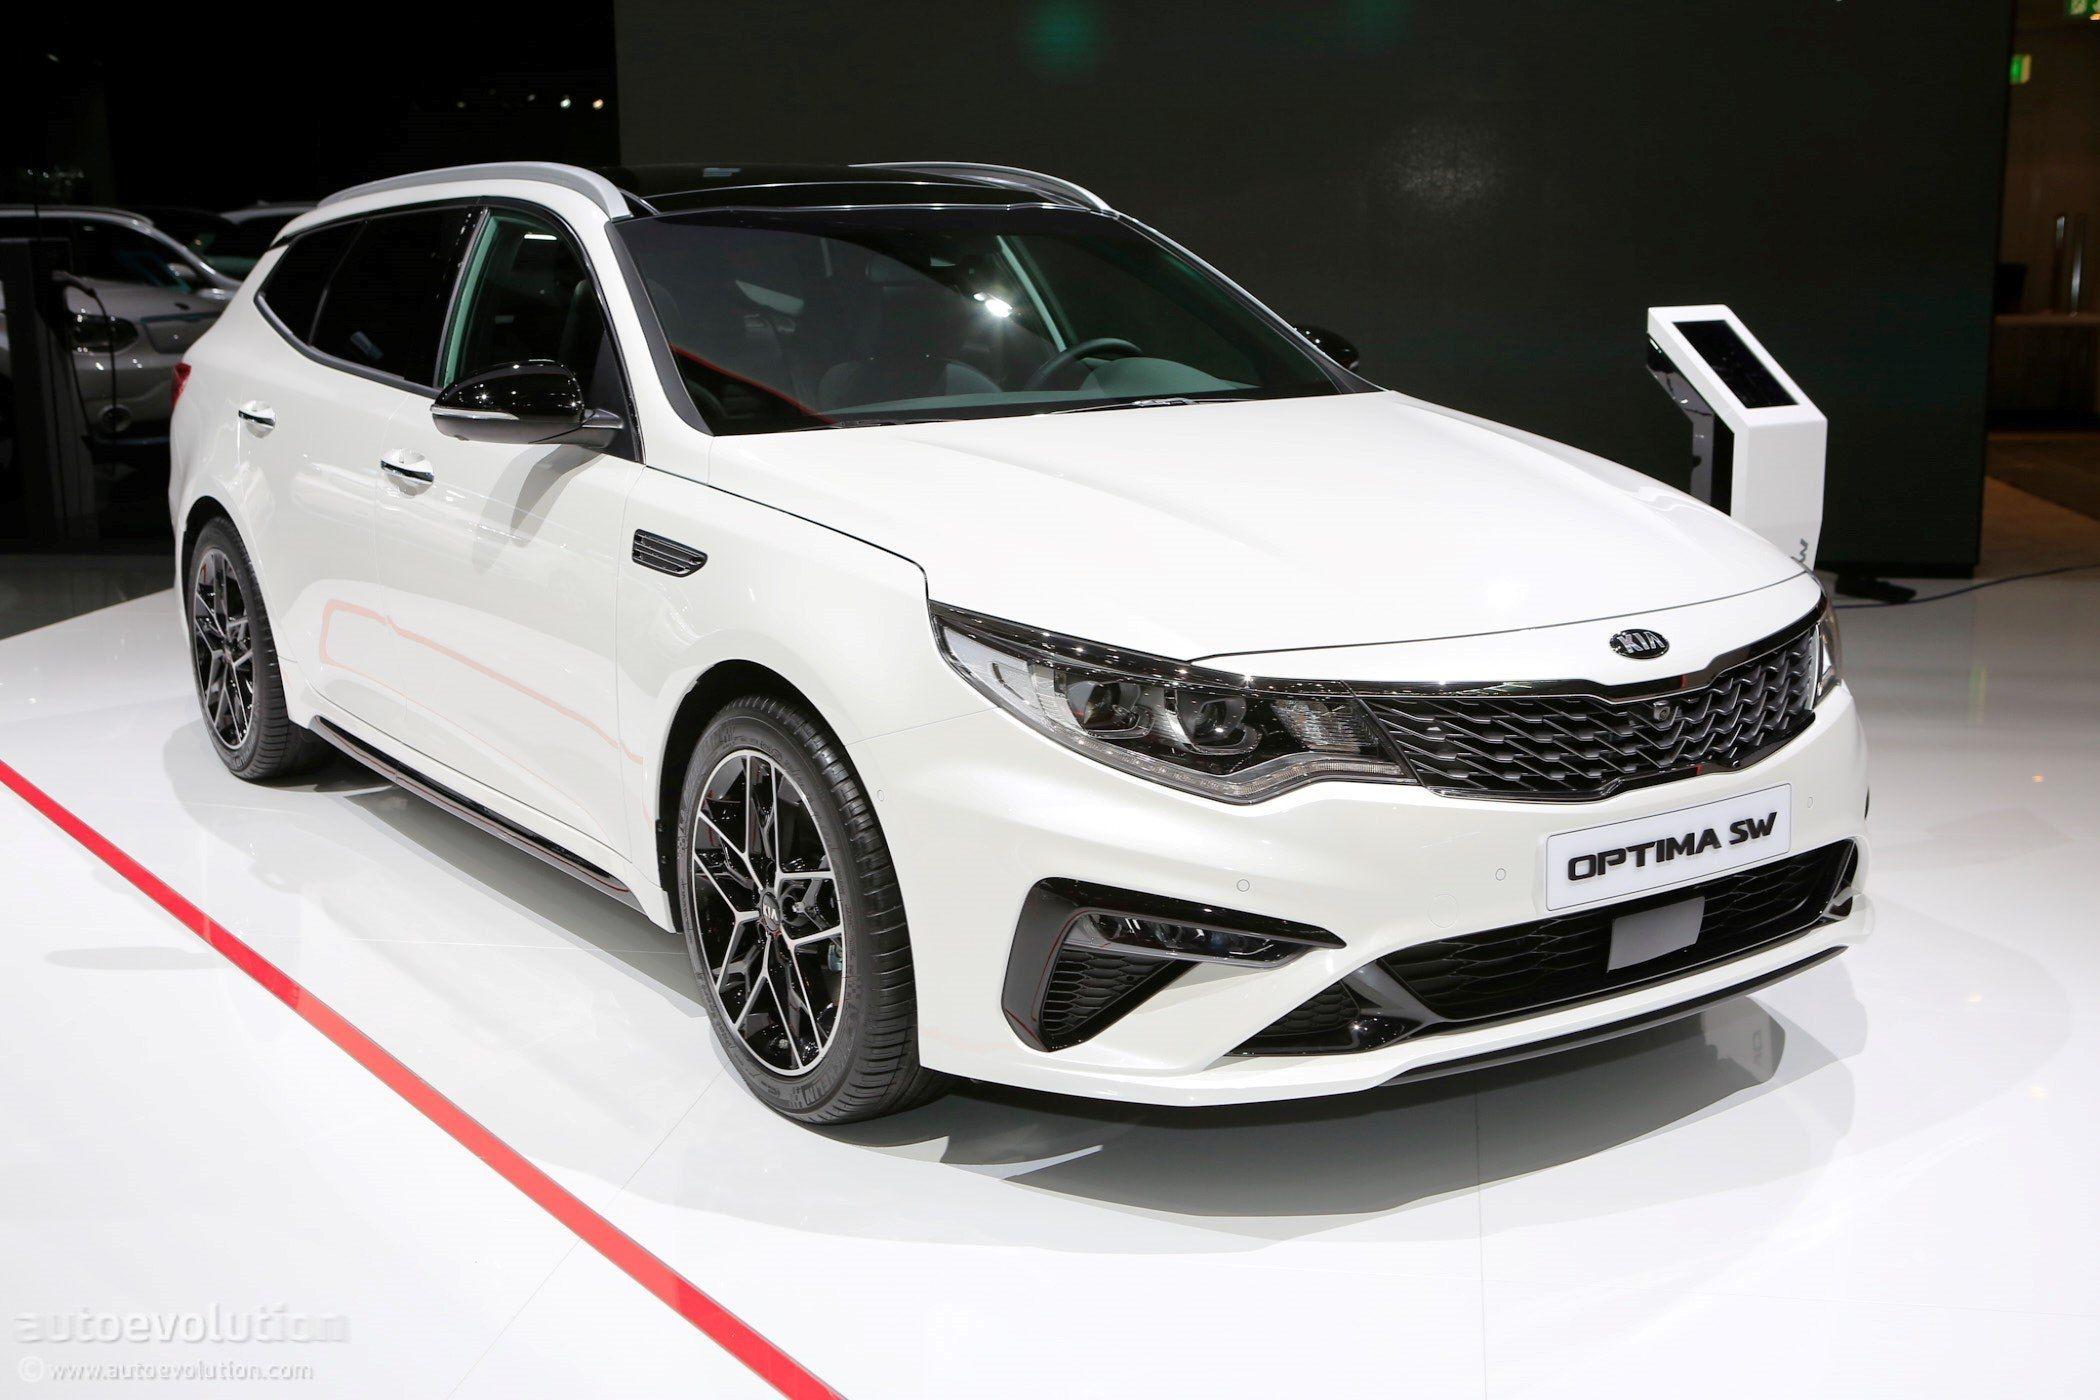 Top Kia Rio Facelift 2020 New Review 2020 Cars Release Date Kia Optima Kia Picanto Kia Rio